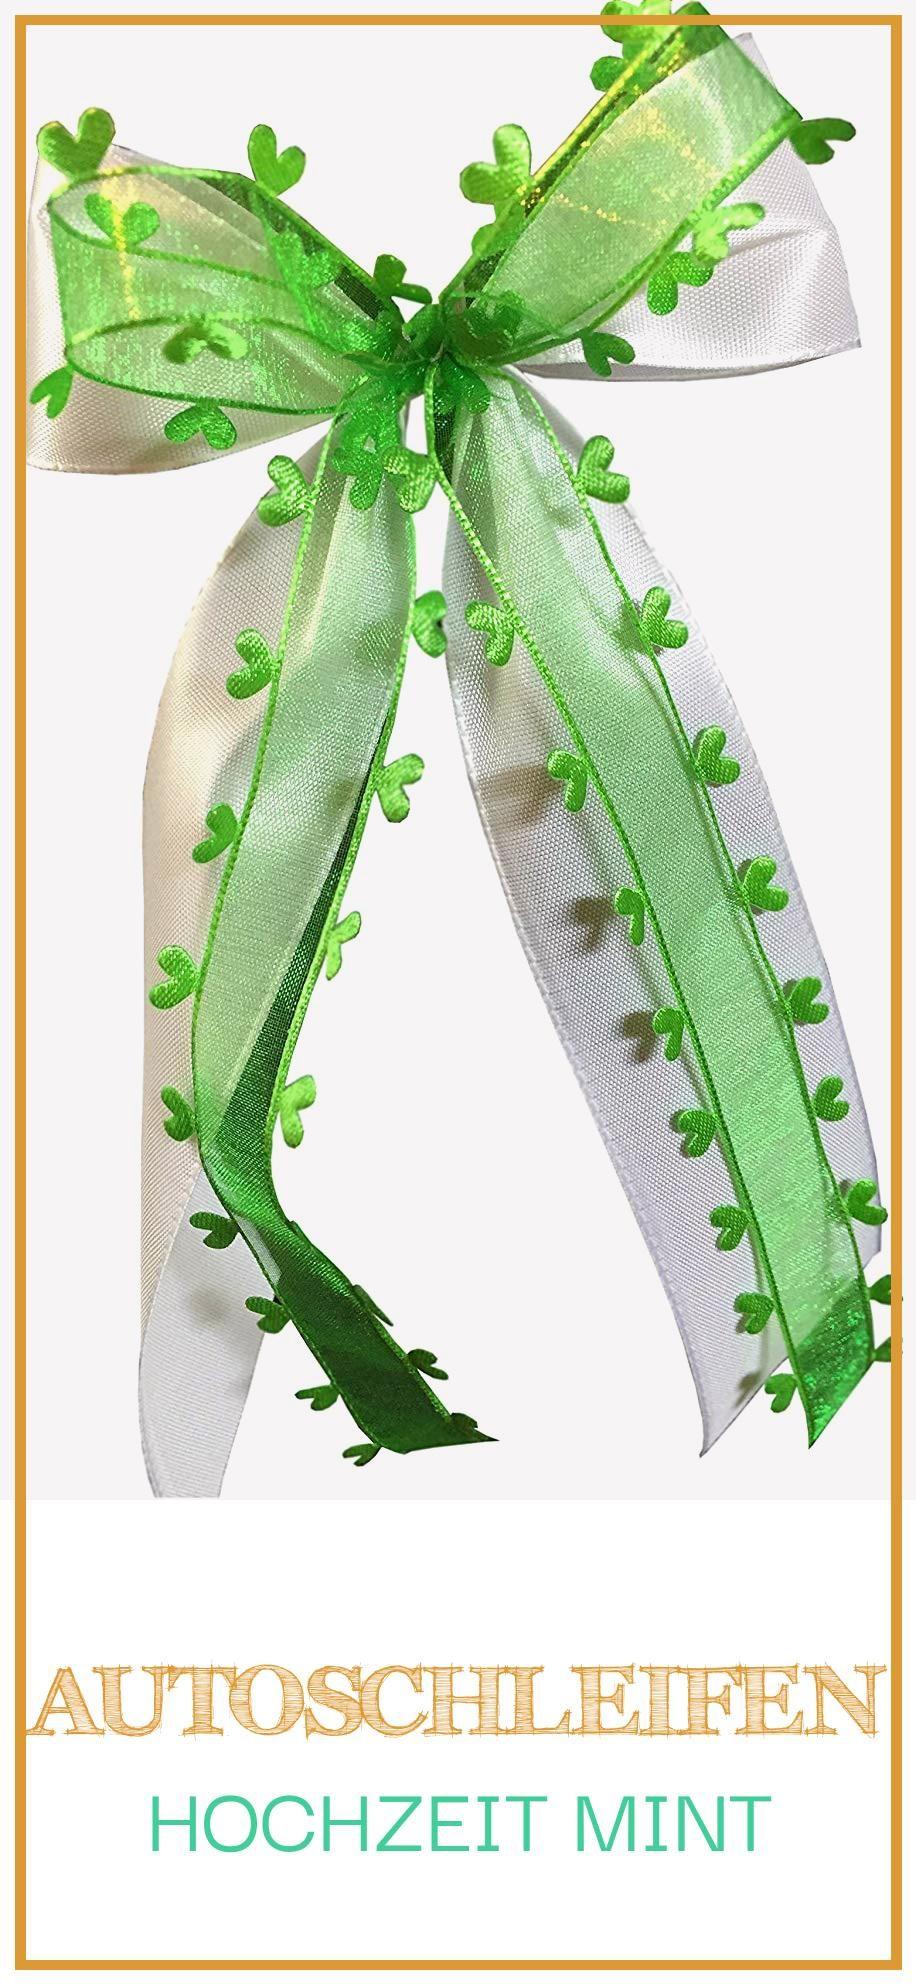 Large 18 Autoschleifen Hochzeit Mint Cactus Plants Wedding Concept